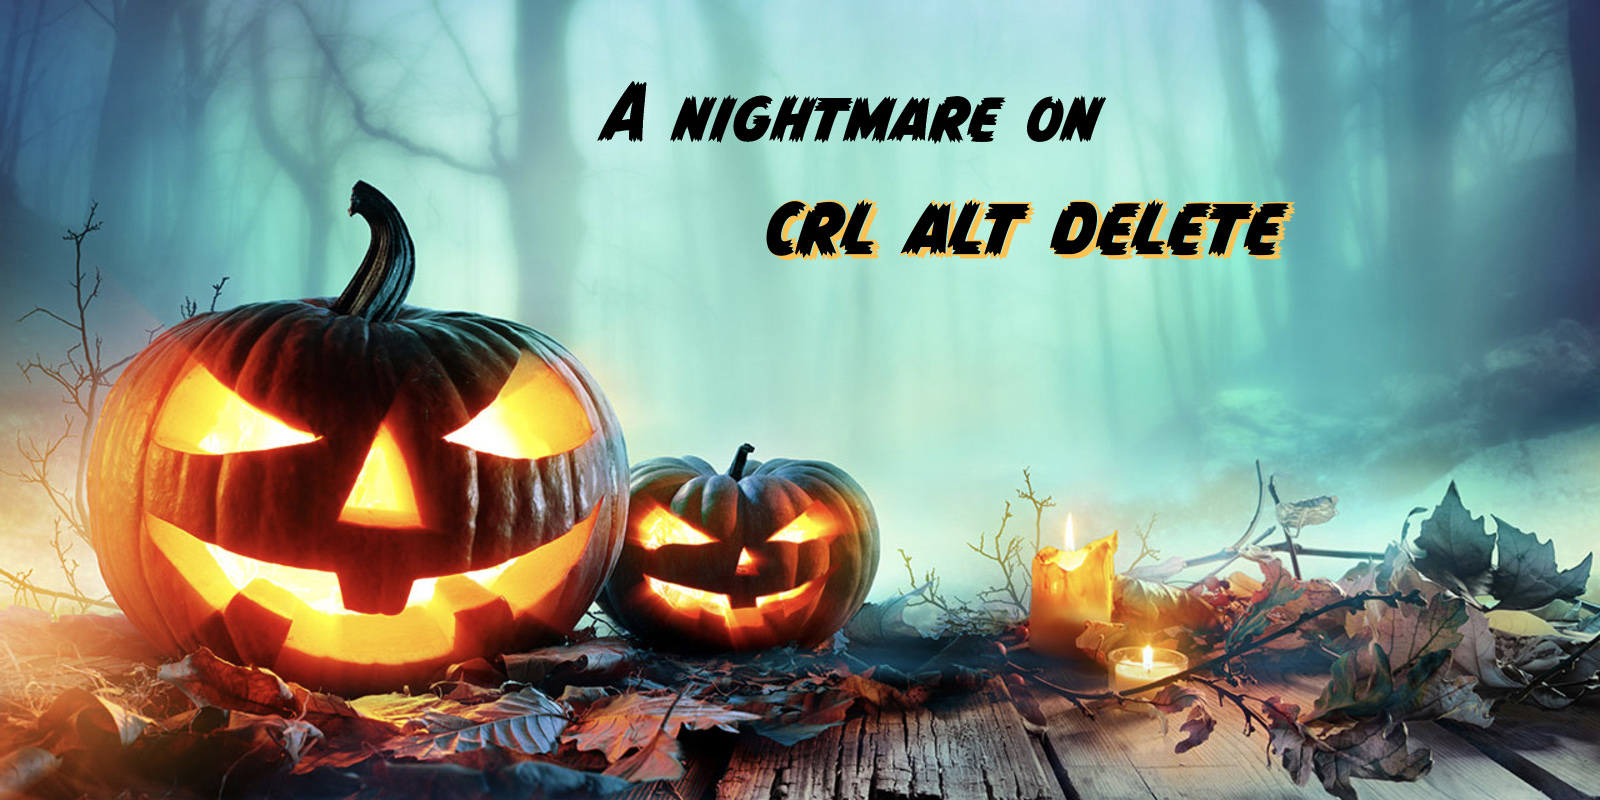 A nightmare on crl alt delete